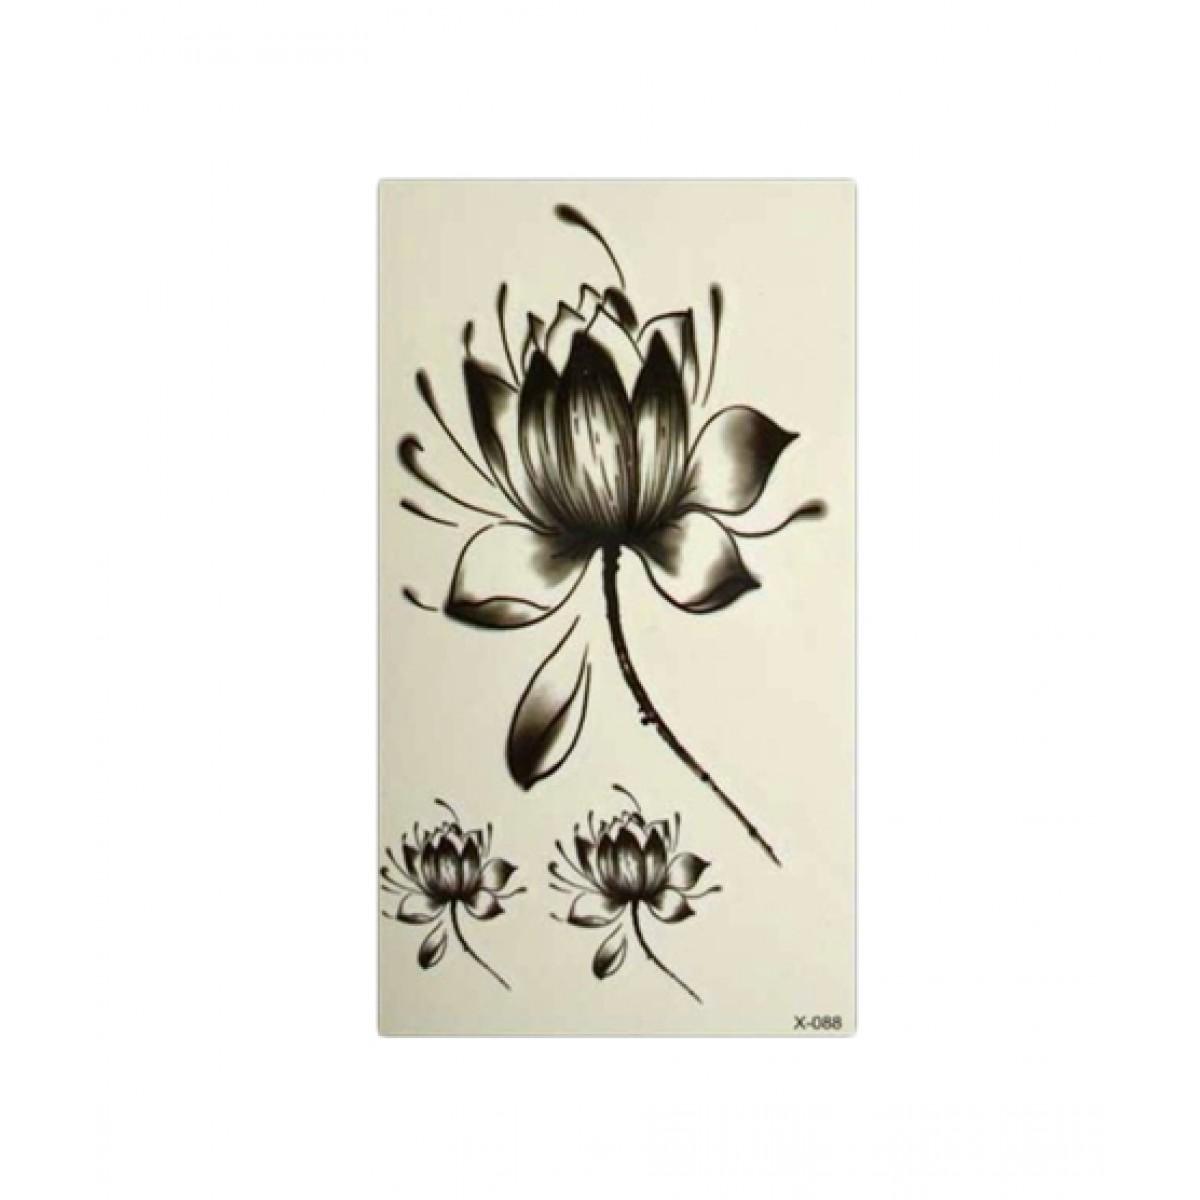 Water Lily Lotus Flower Tattoos Stickers Price In Pakistan Buy